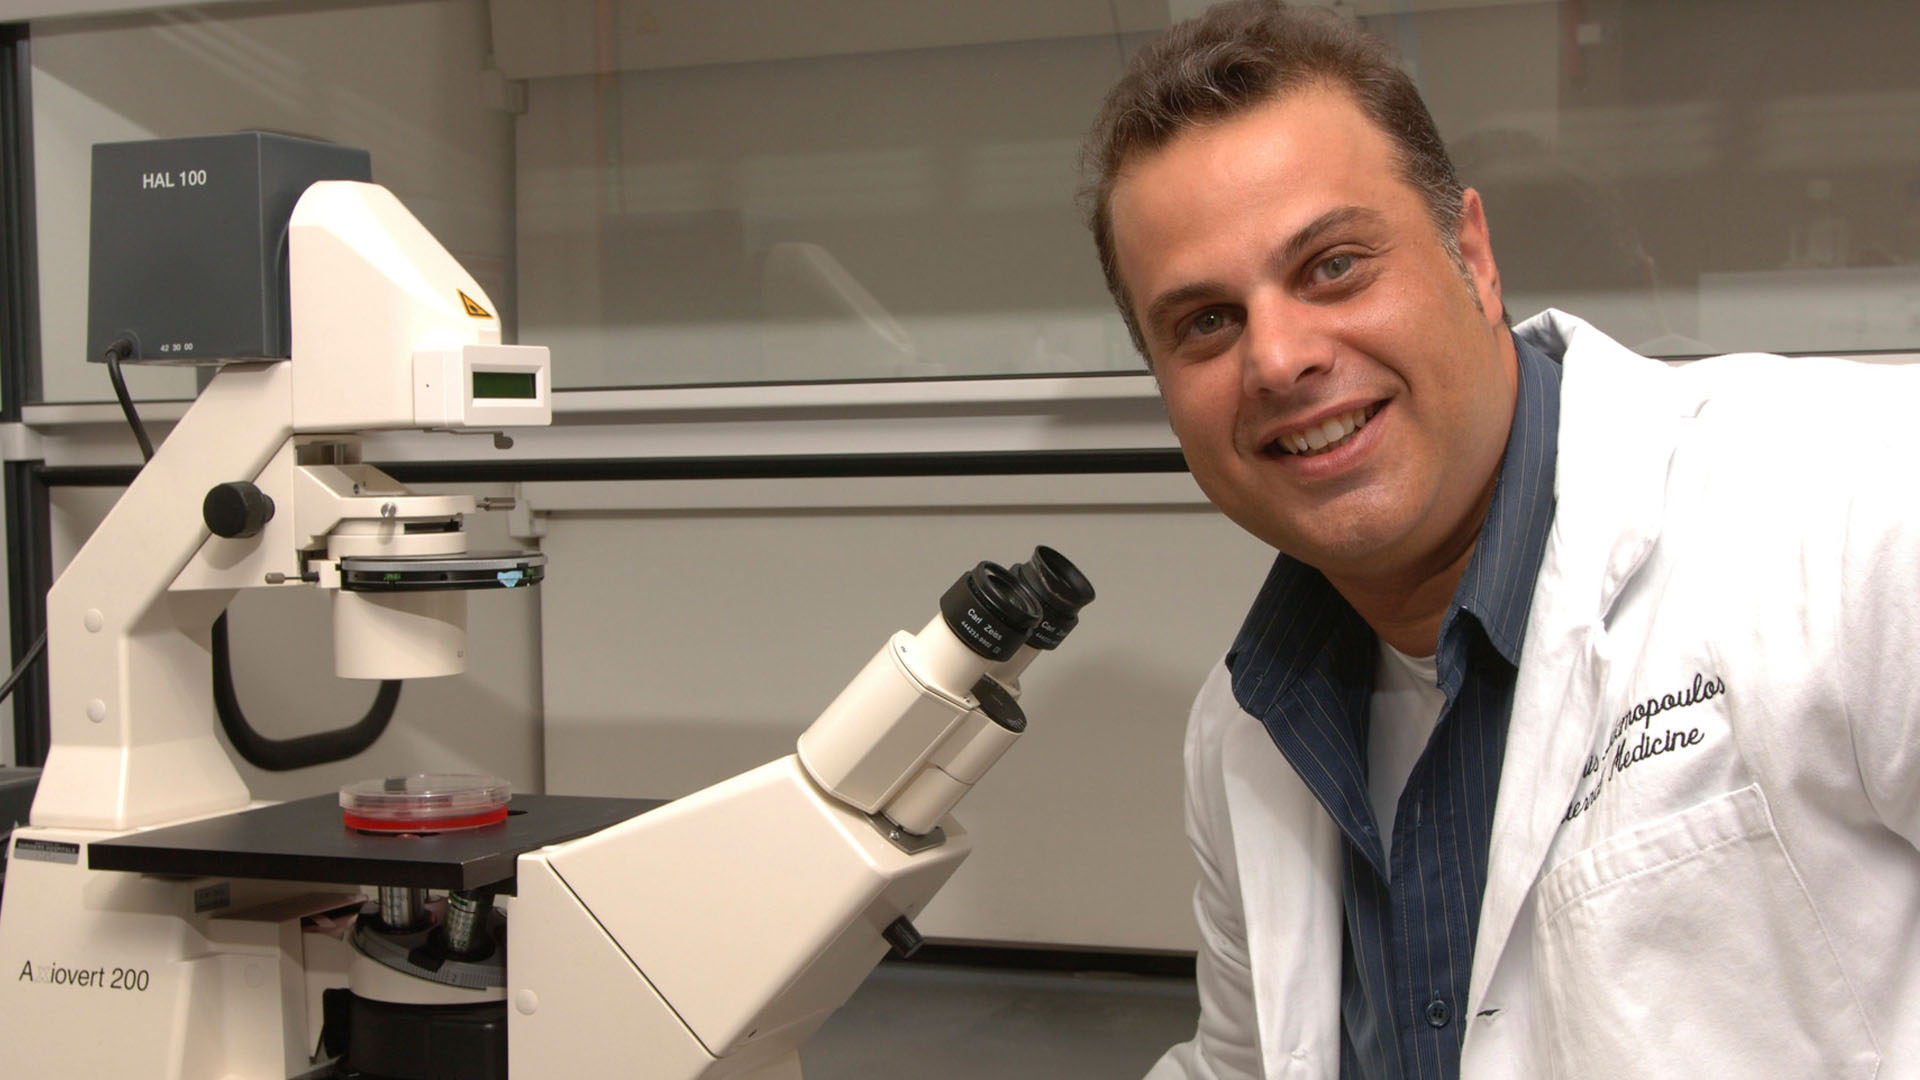 Iannis Adamopoulos researches rheumatoid arthritis